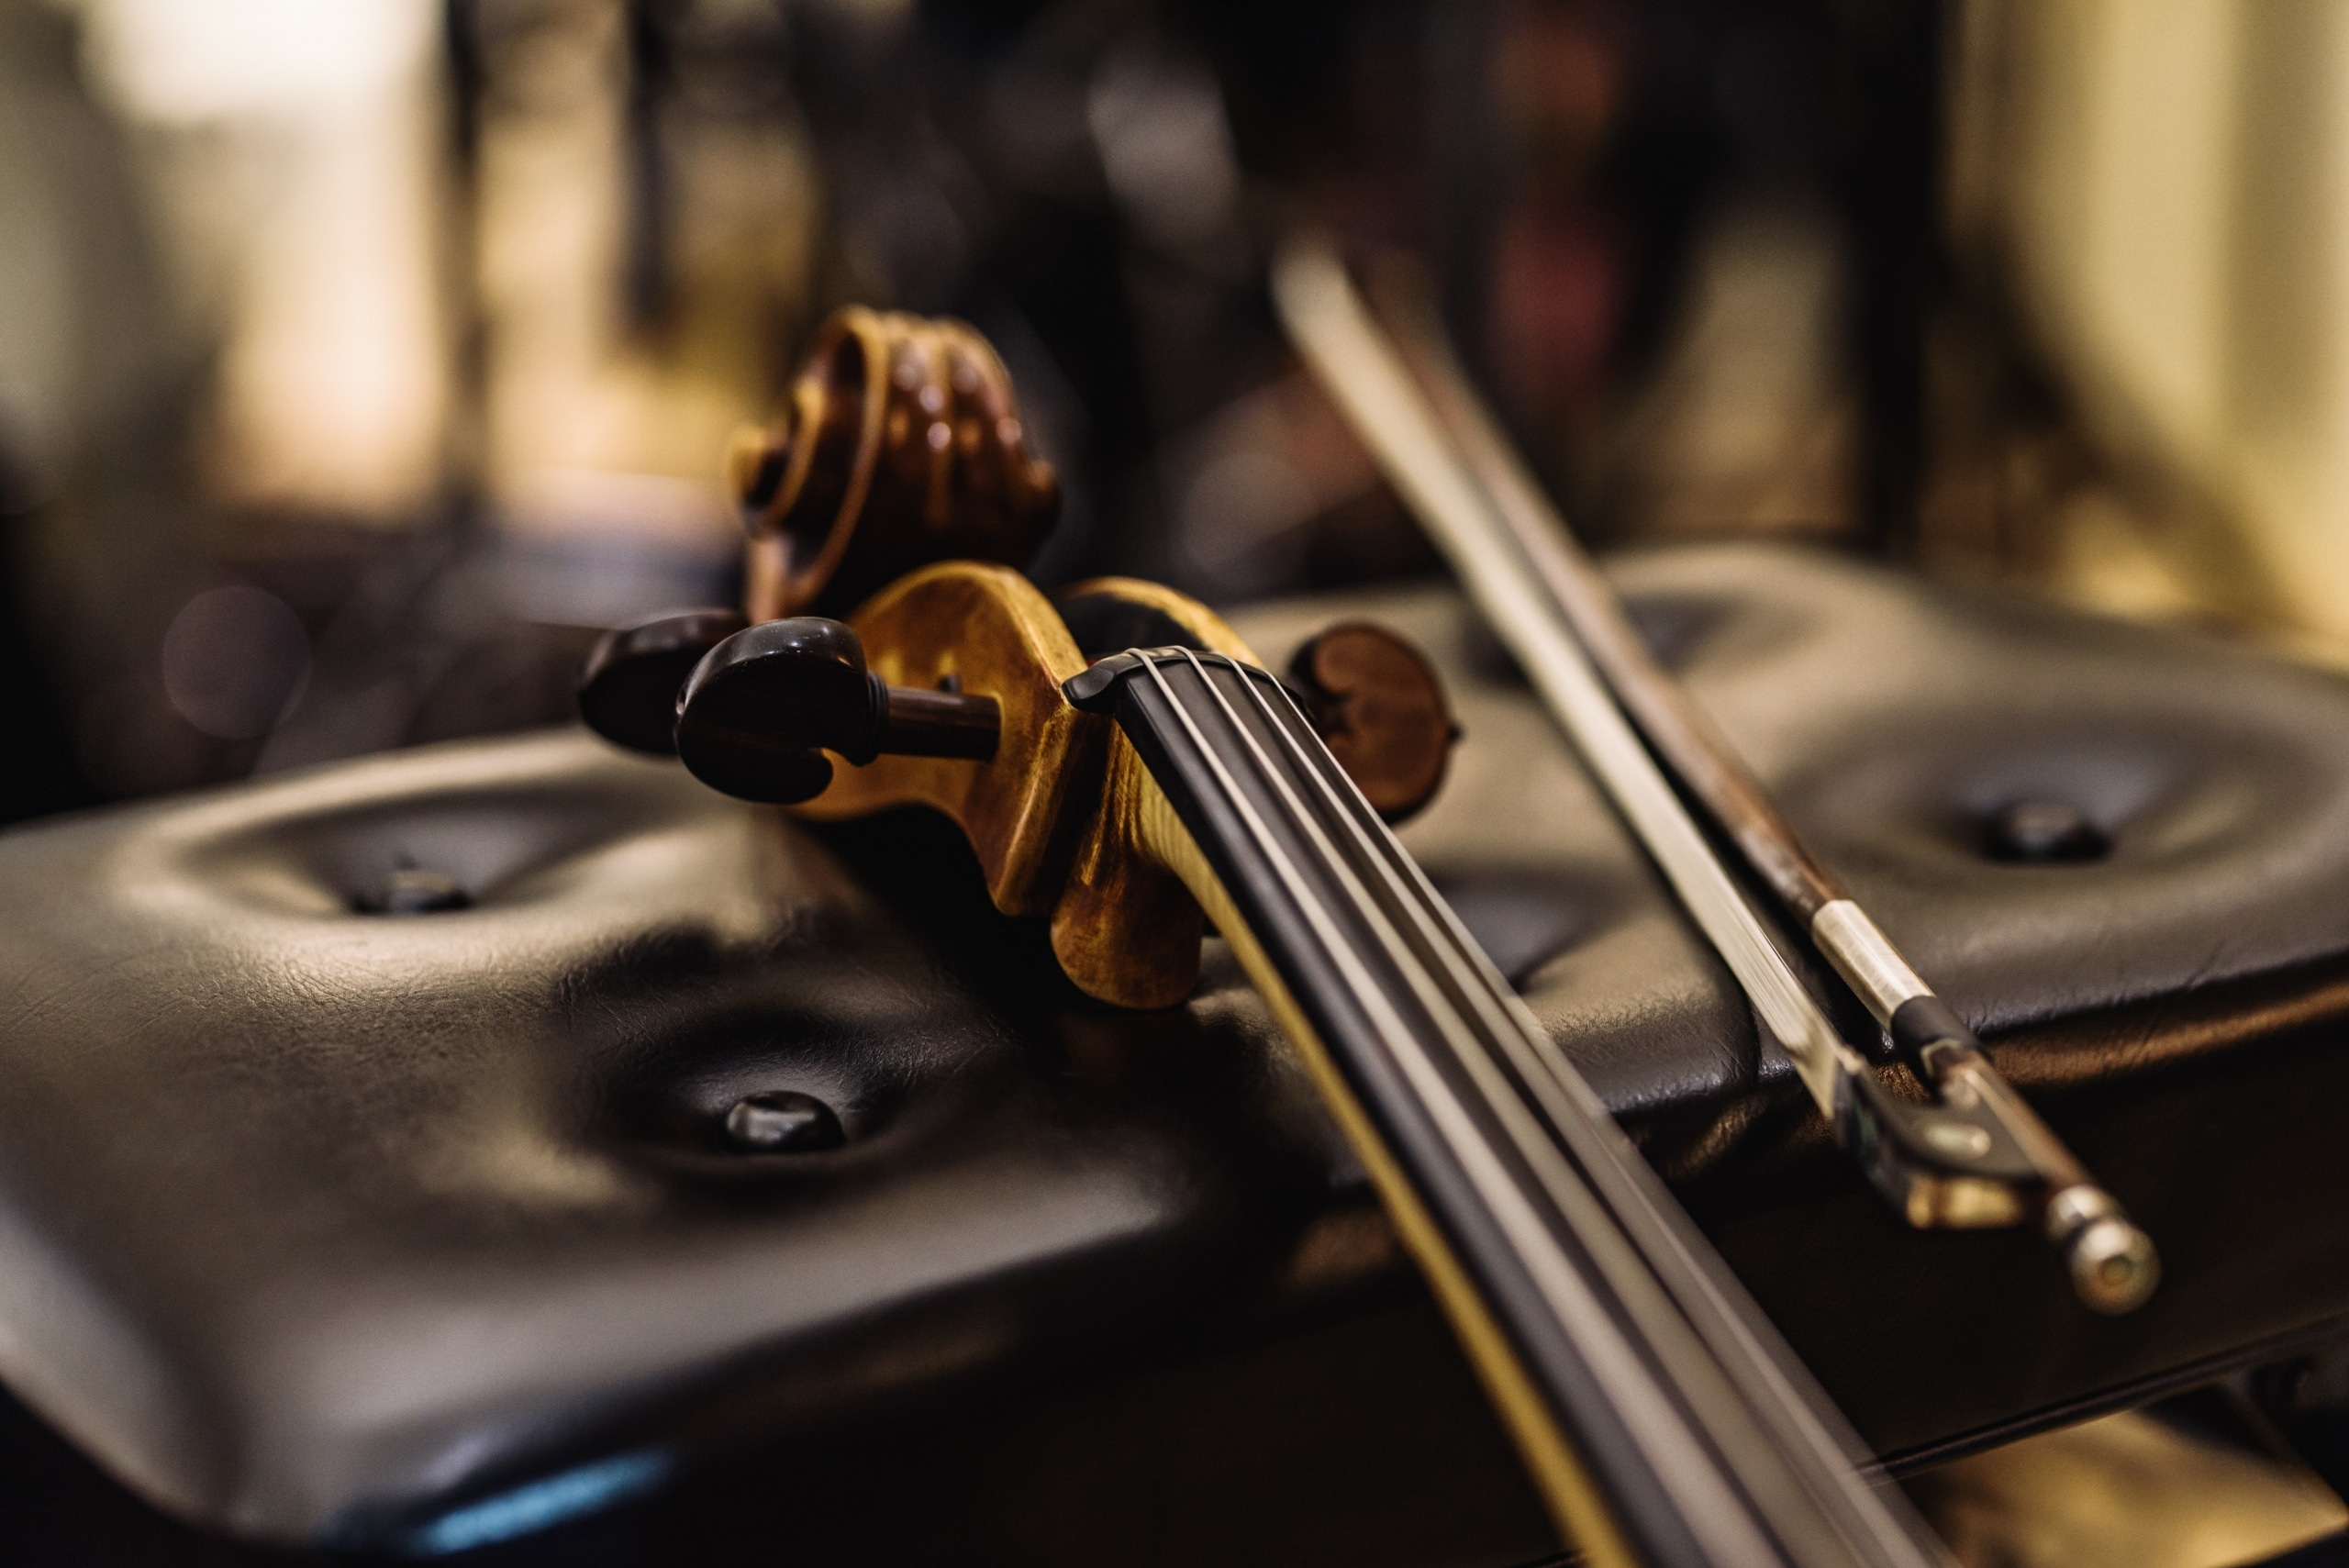 Cello Electronic Music